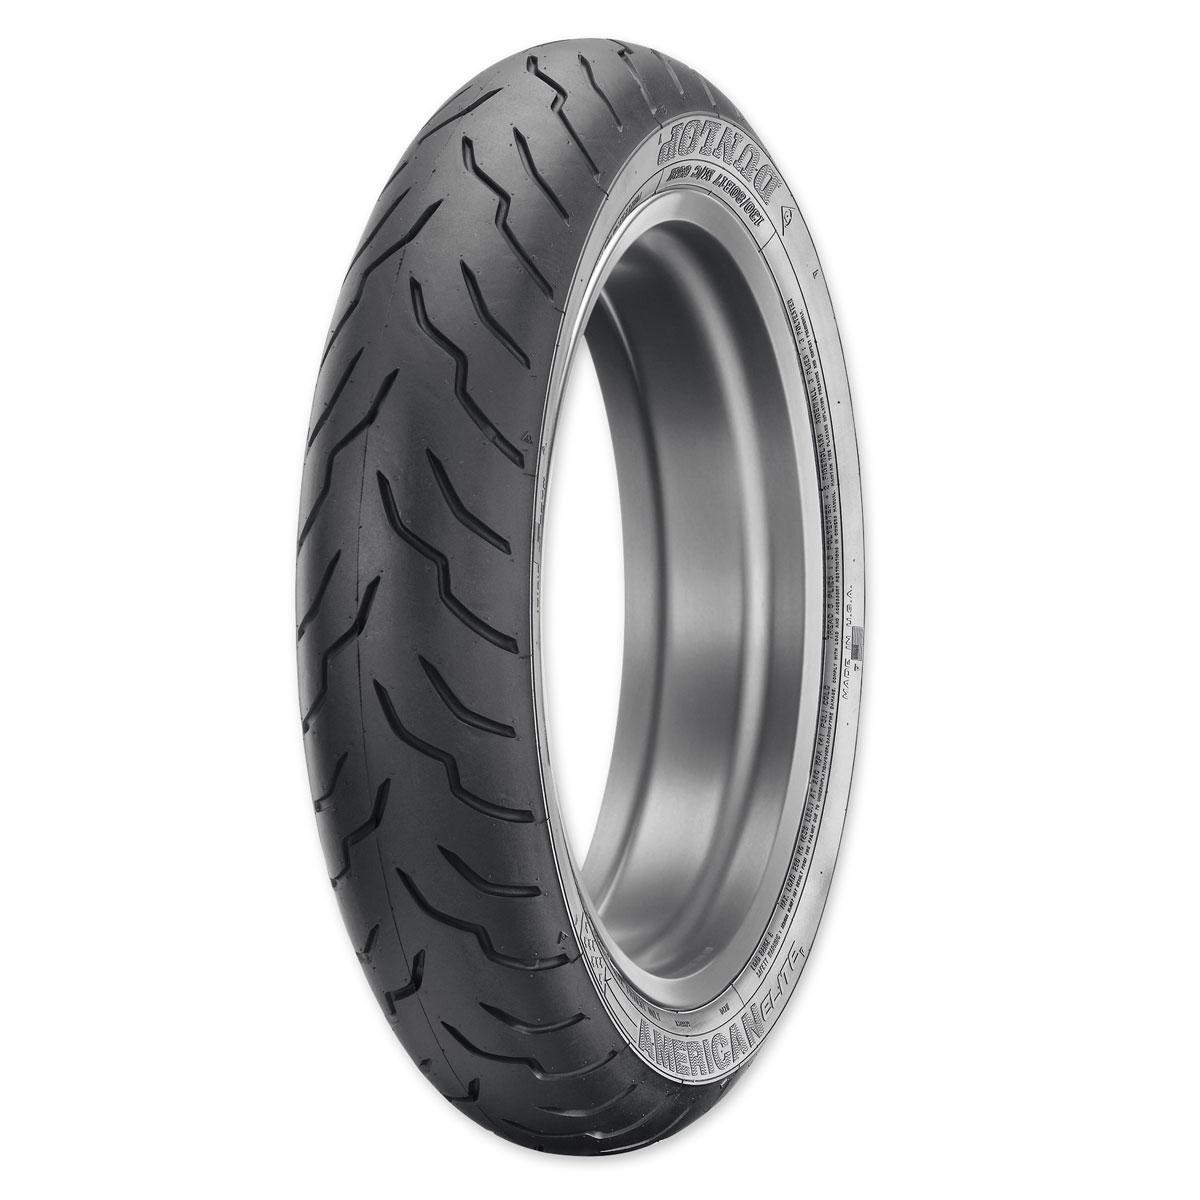 Dunlop American Elite Front Motorcycle Tir